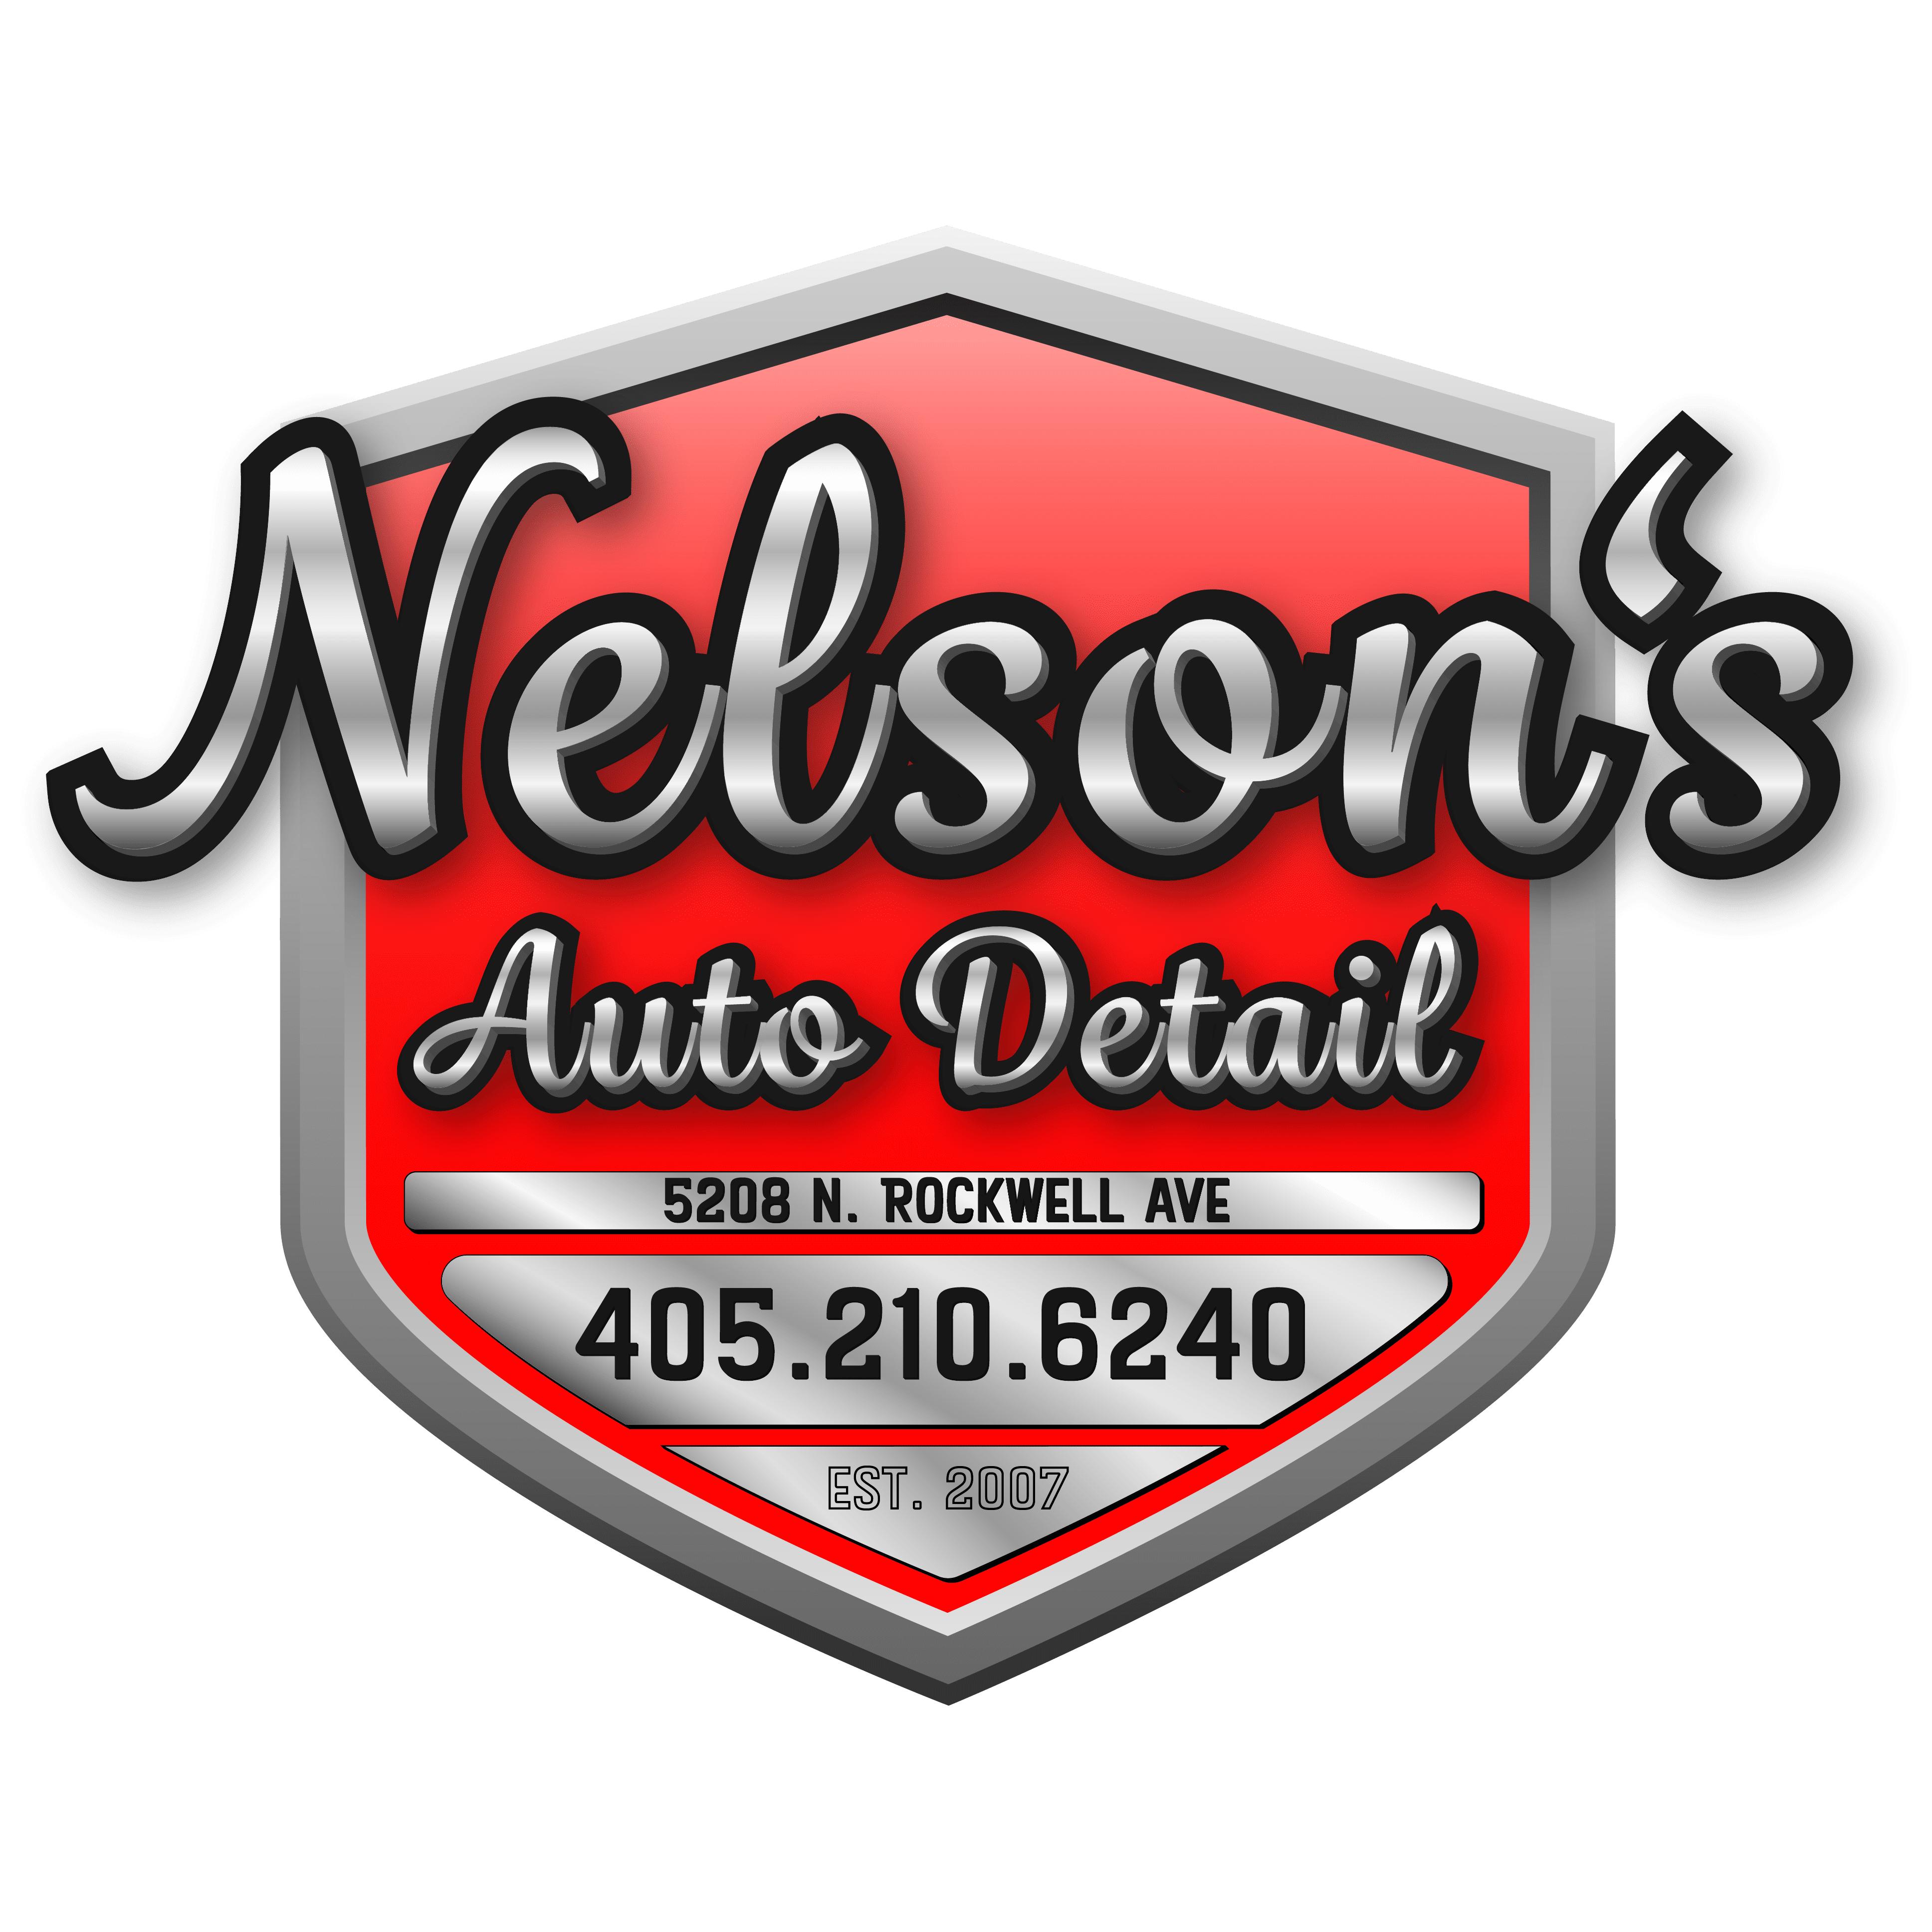 Nelsons Auto Detail llc